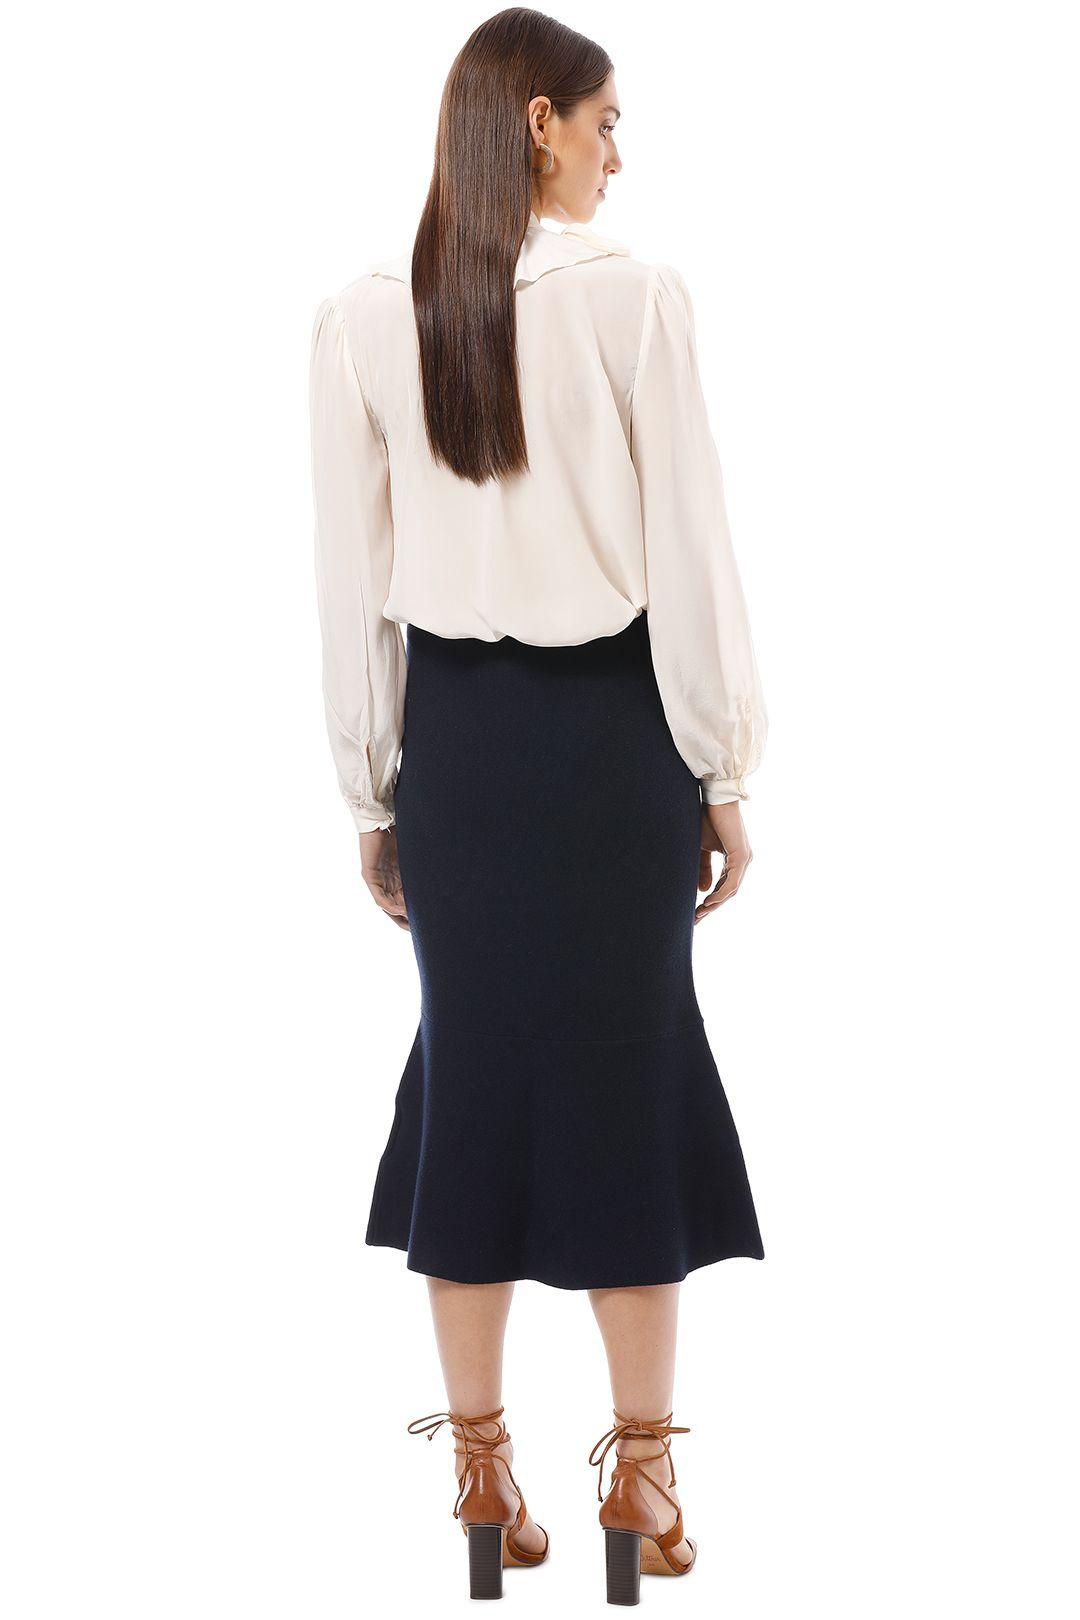 Friend of Audrey - Eleanor Midi Skirt - Navy - Back